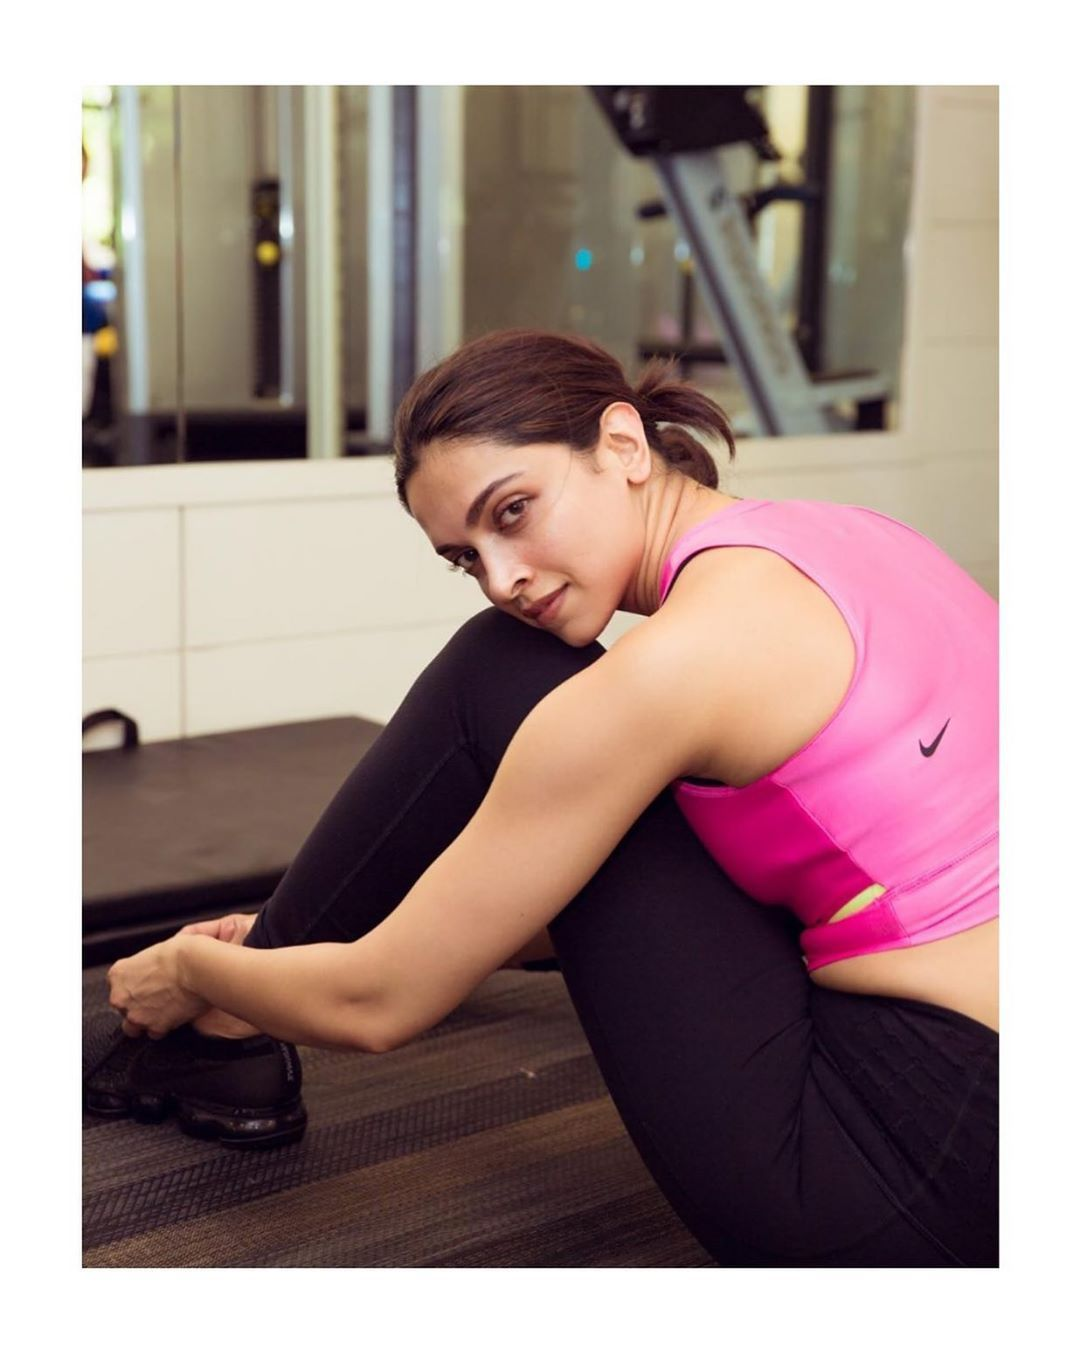 Pin By Pankaj Kumawat On Indian Cinema Deepika Padukone Hot Workout Pictures Gym Workouts Pictures